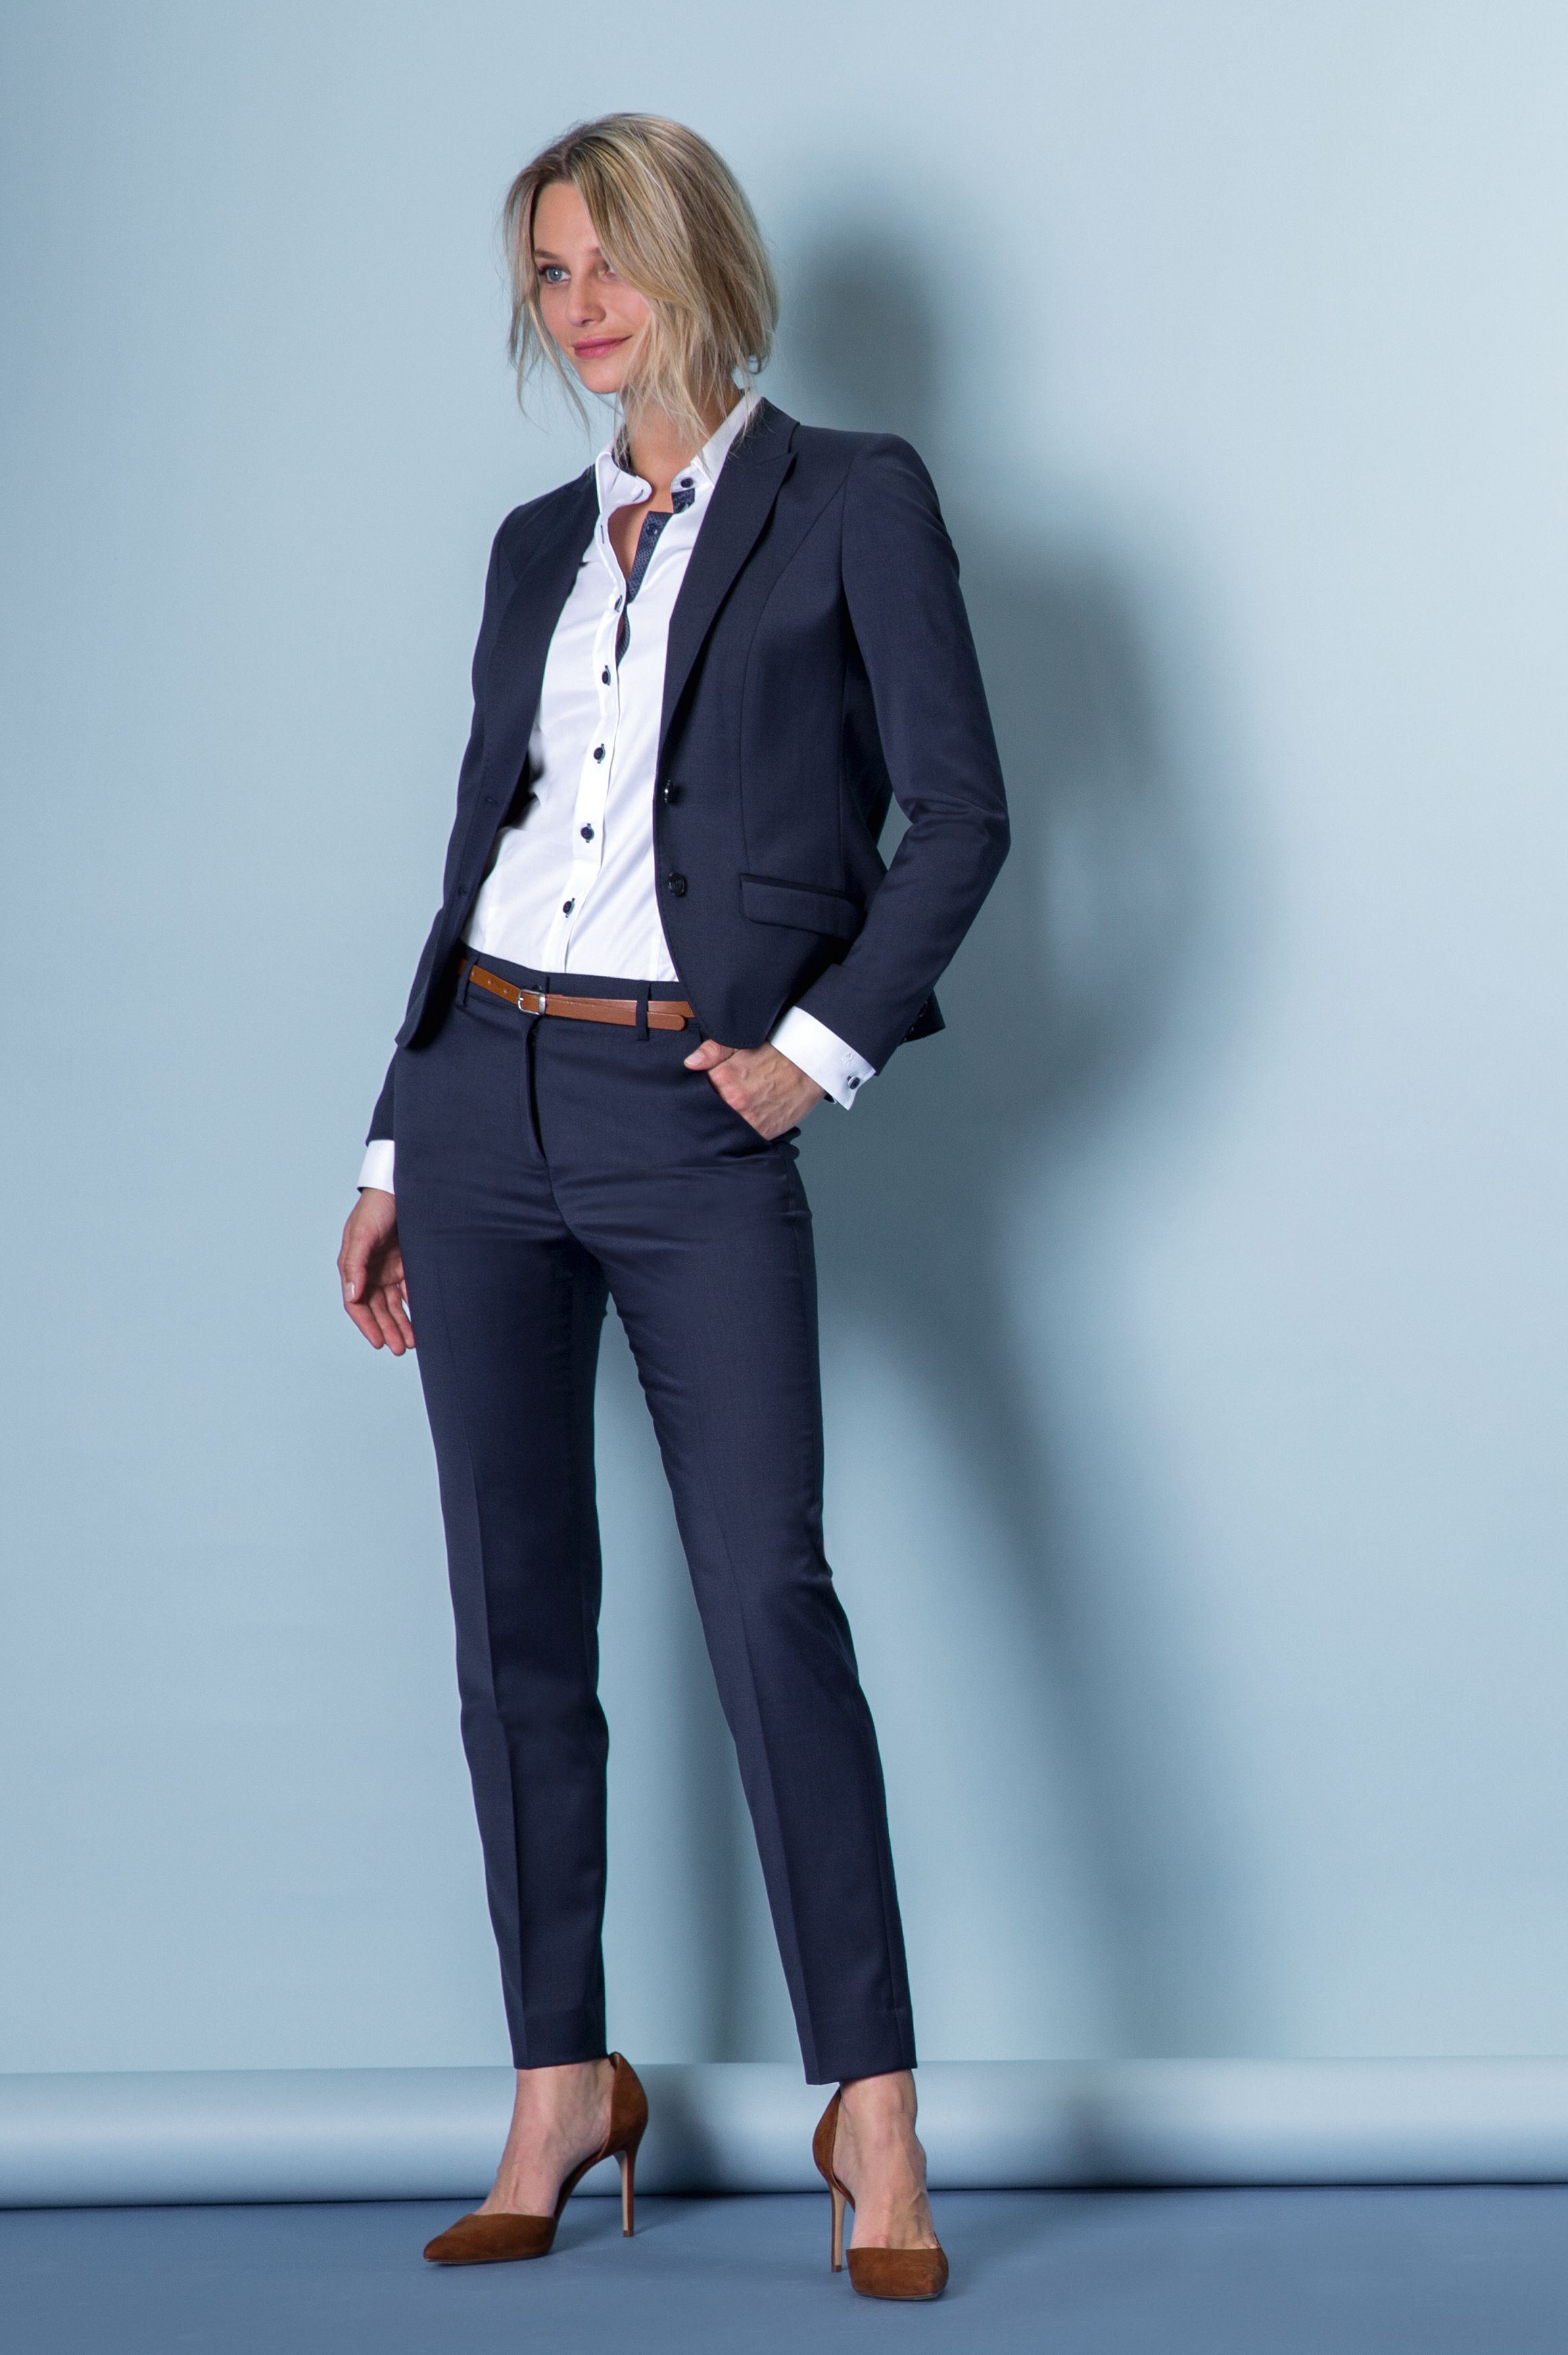 collection 2019 20 women business look blazer trousers dark blue